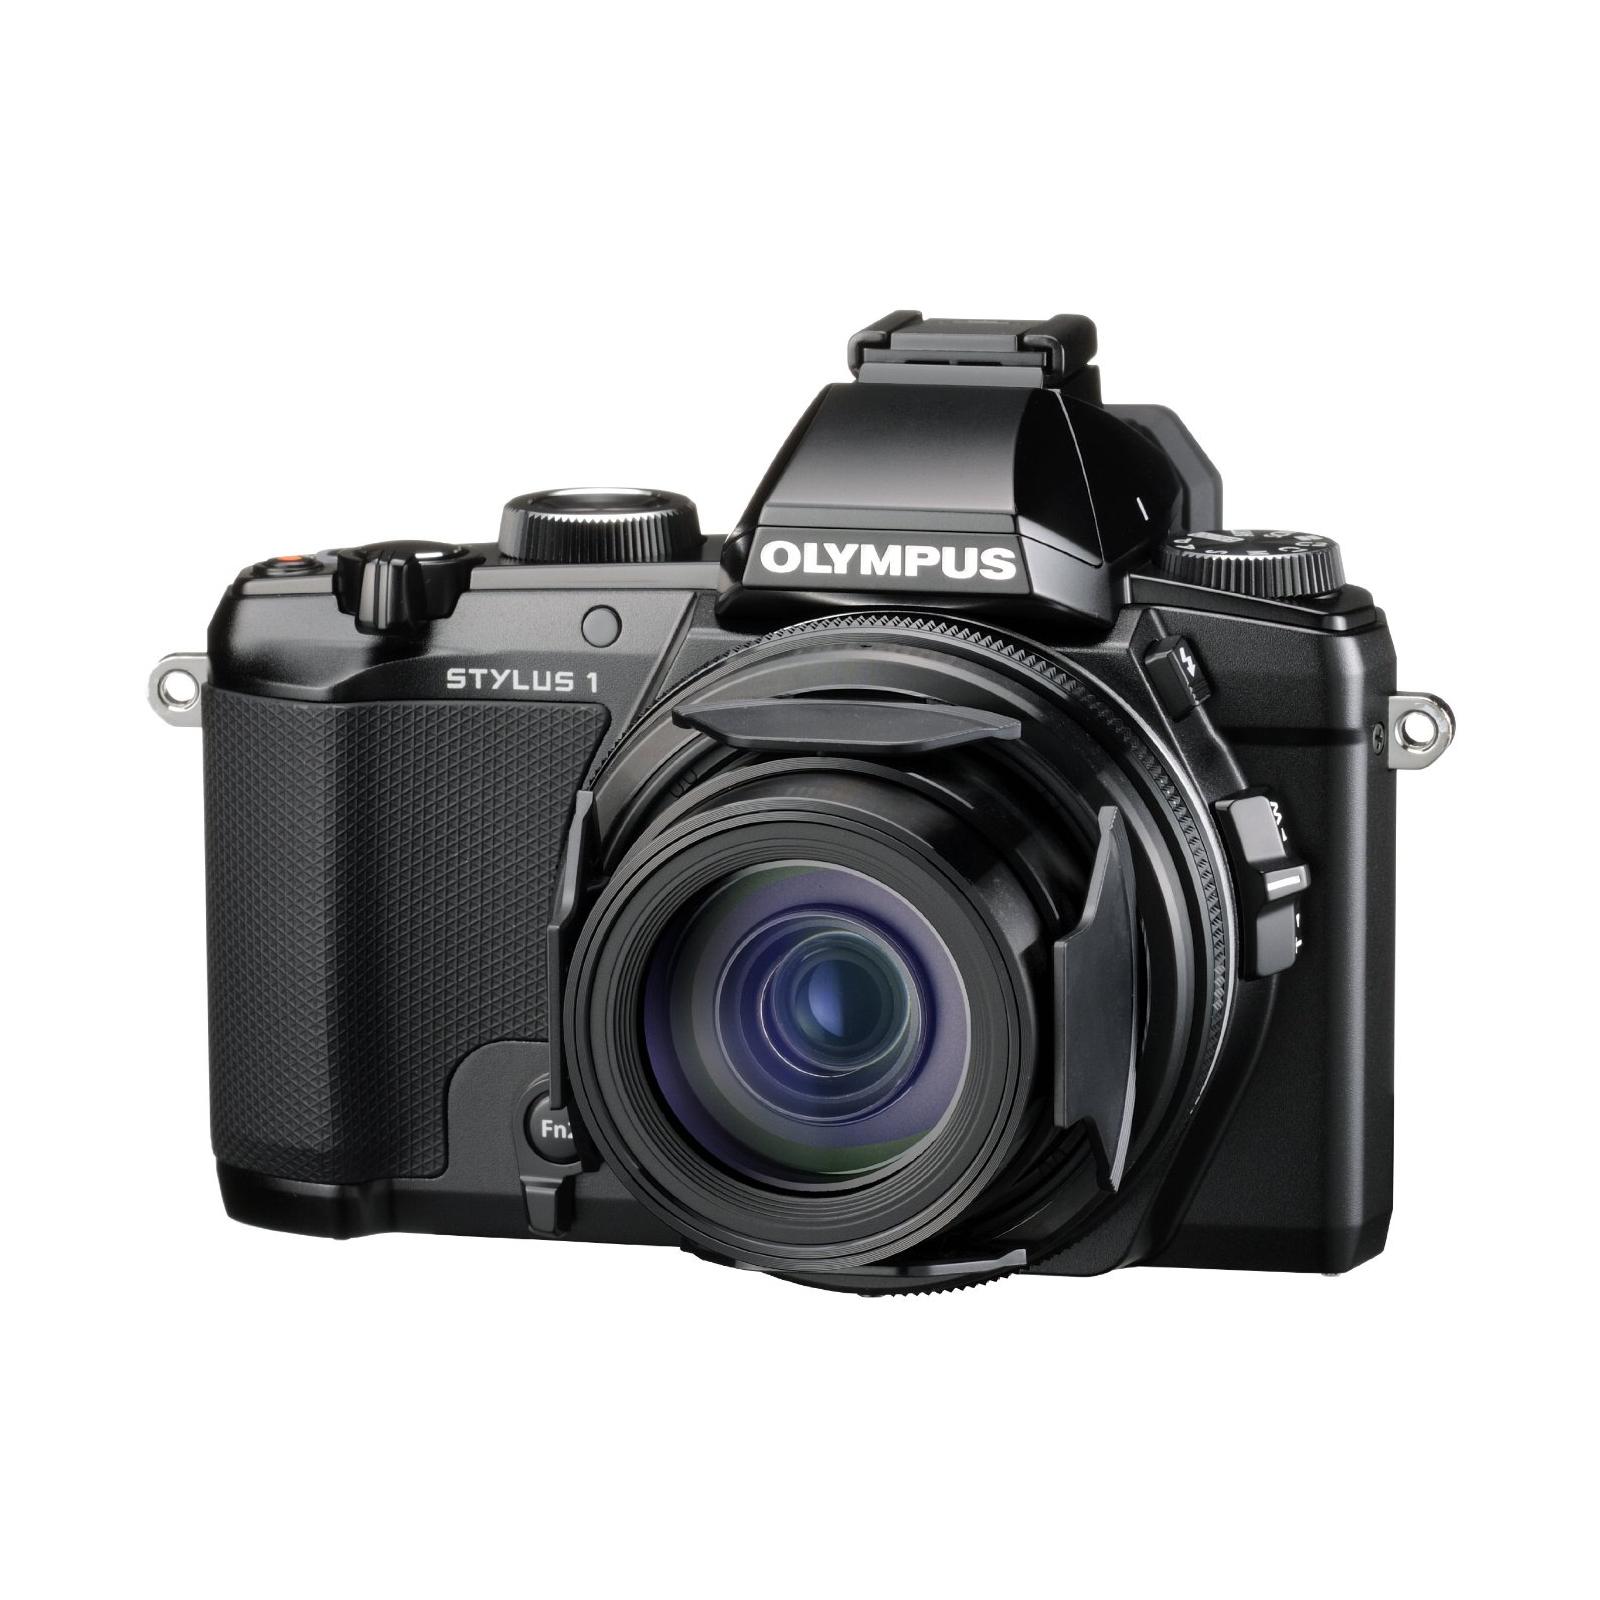 Цифровой фотоаппарат OLYMPUS STYLUS 1 Black (V109010BE000) изображение 6